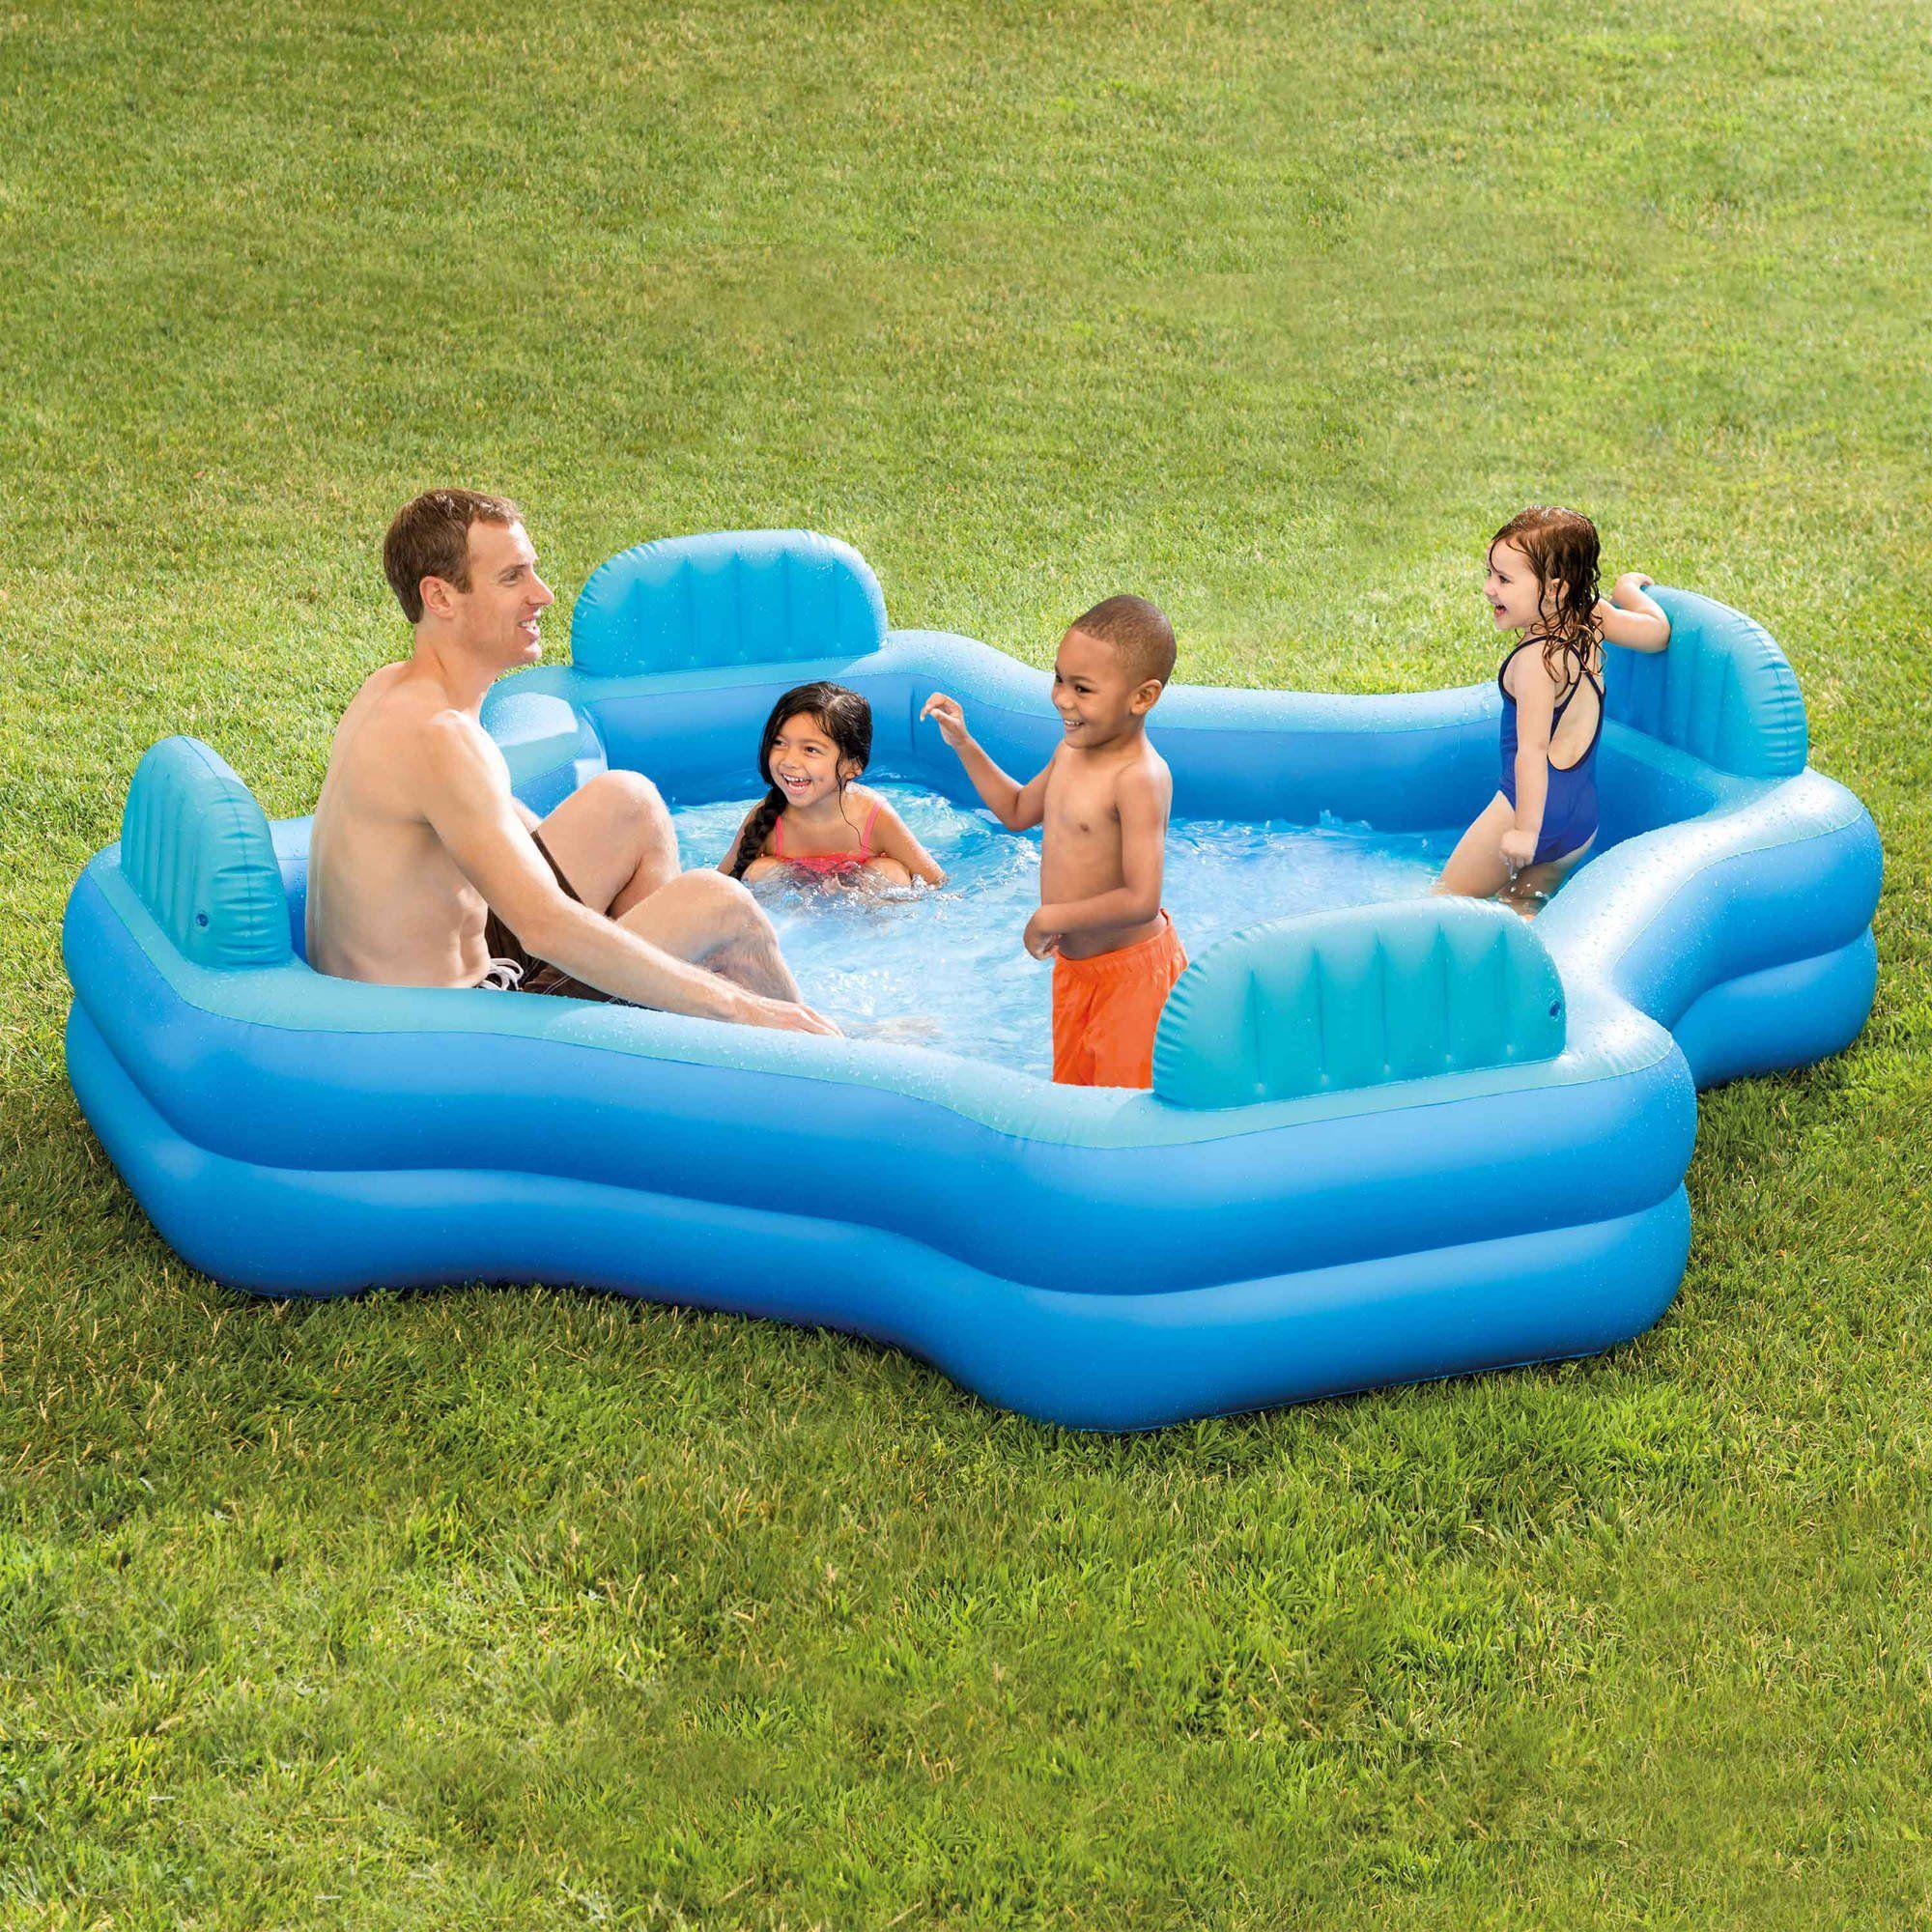 Intex Inflatable Swim Center Family Lounge Pool 105 X 105 X 26 Walmart Com Family Lounge Pool Kiddie Pool Pool Lounge